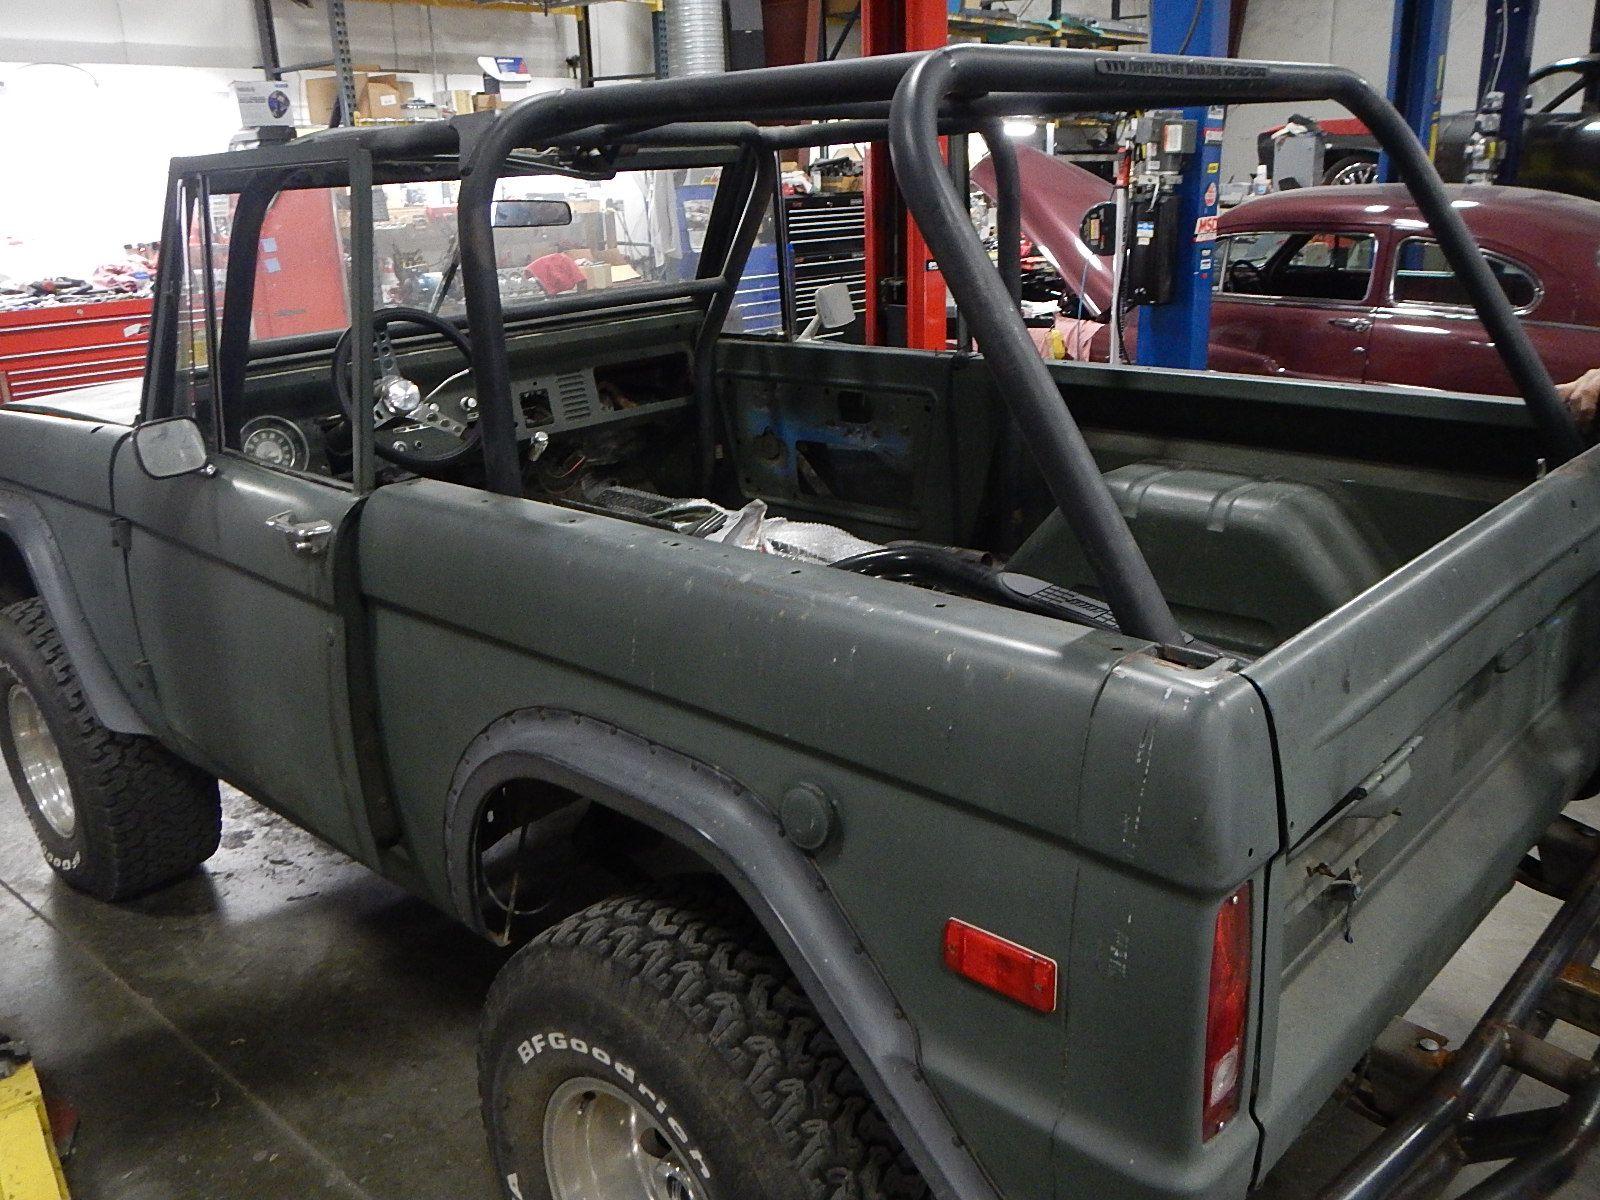 1972 Bronco restoration dis assembly 002.jpg